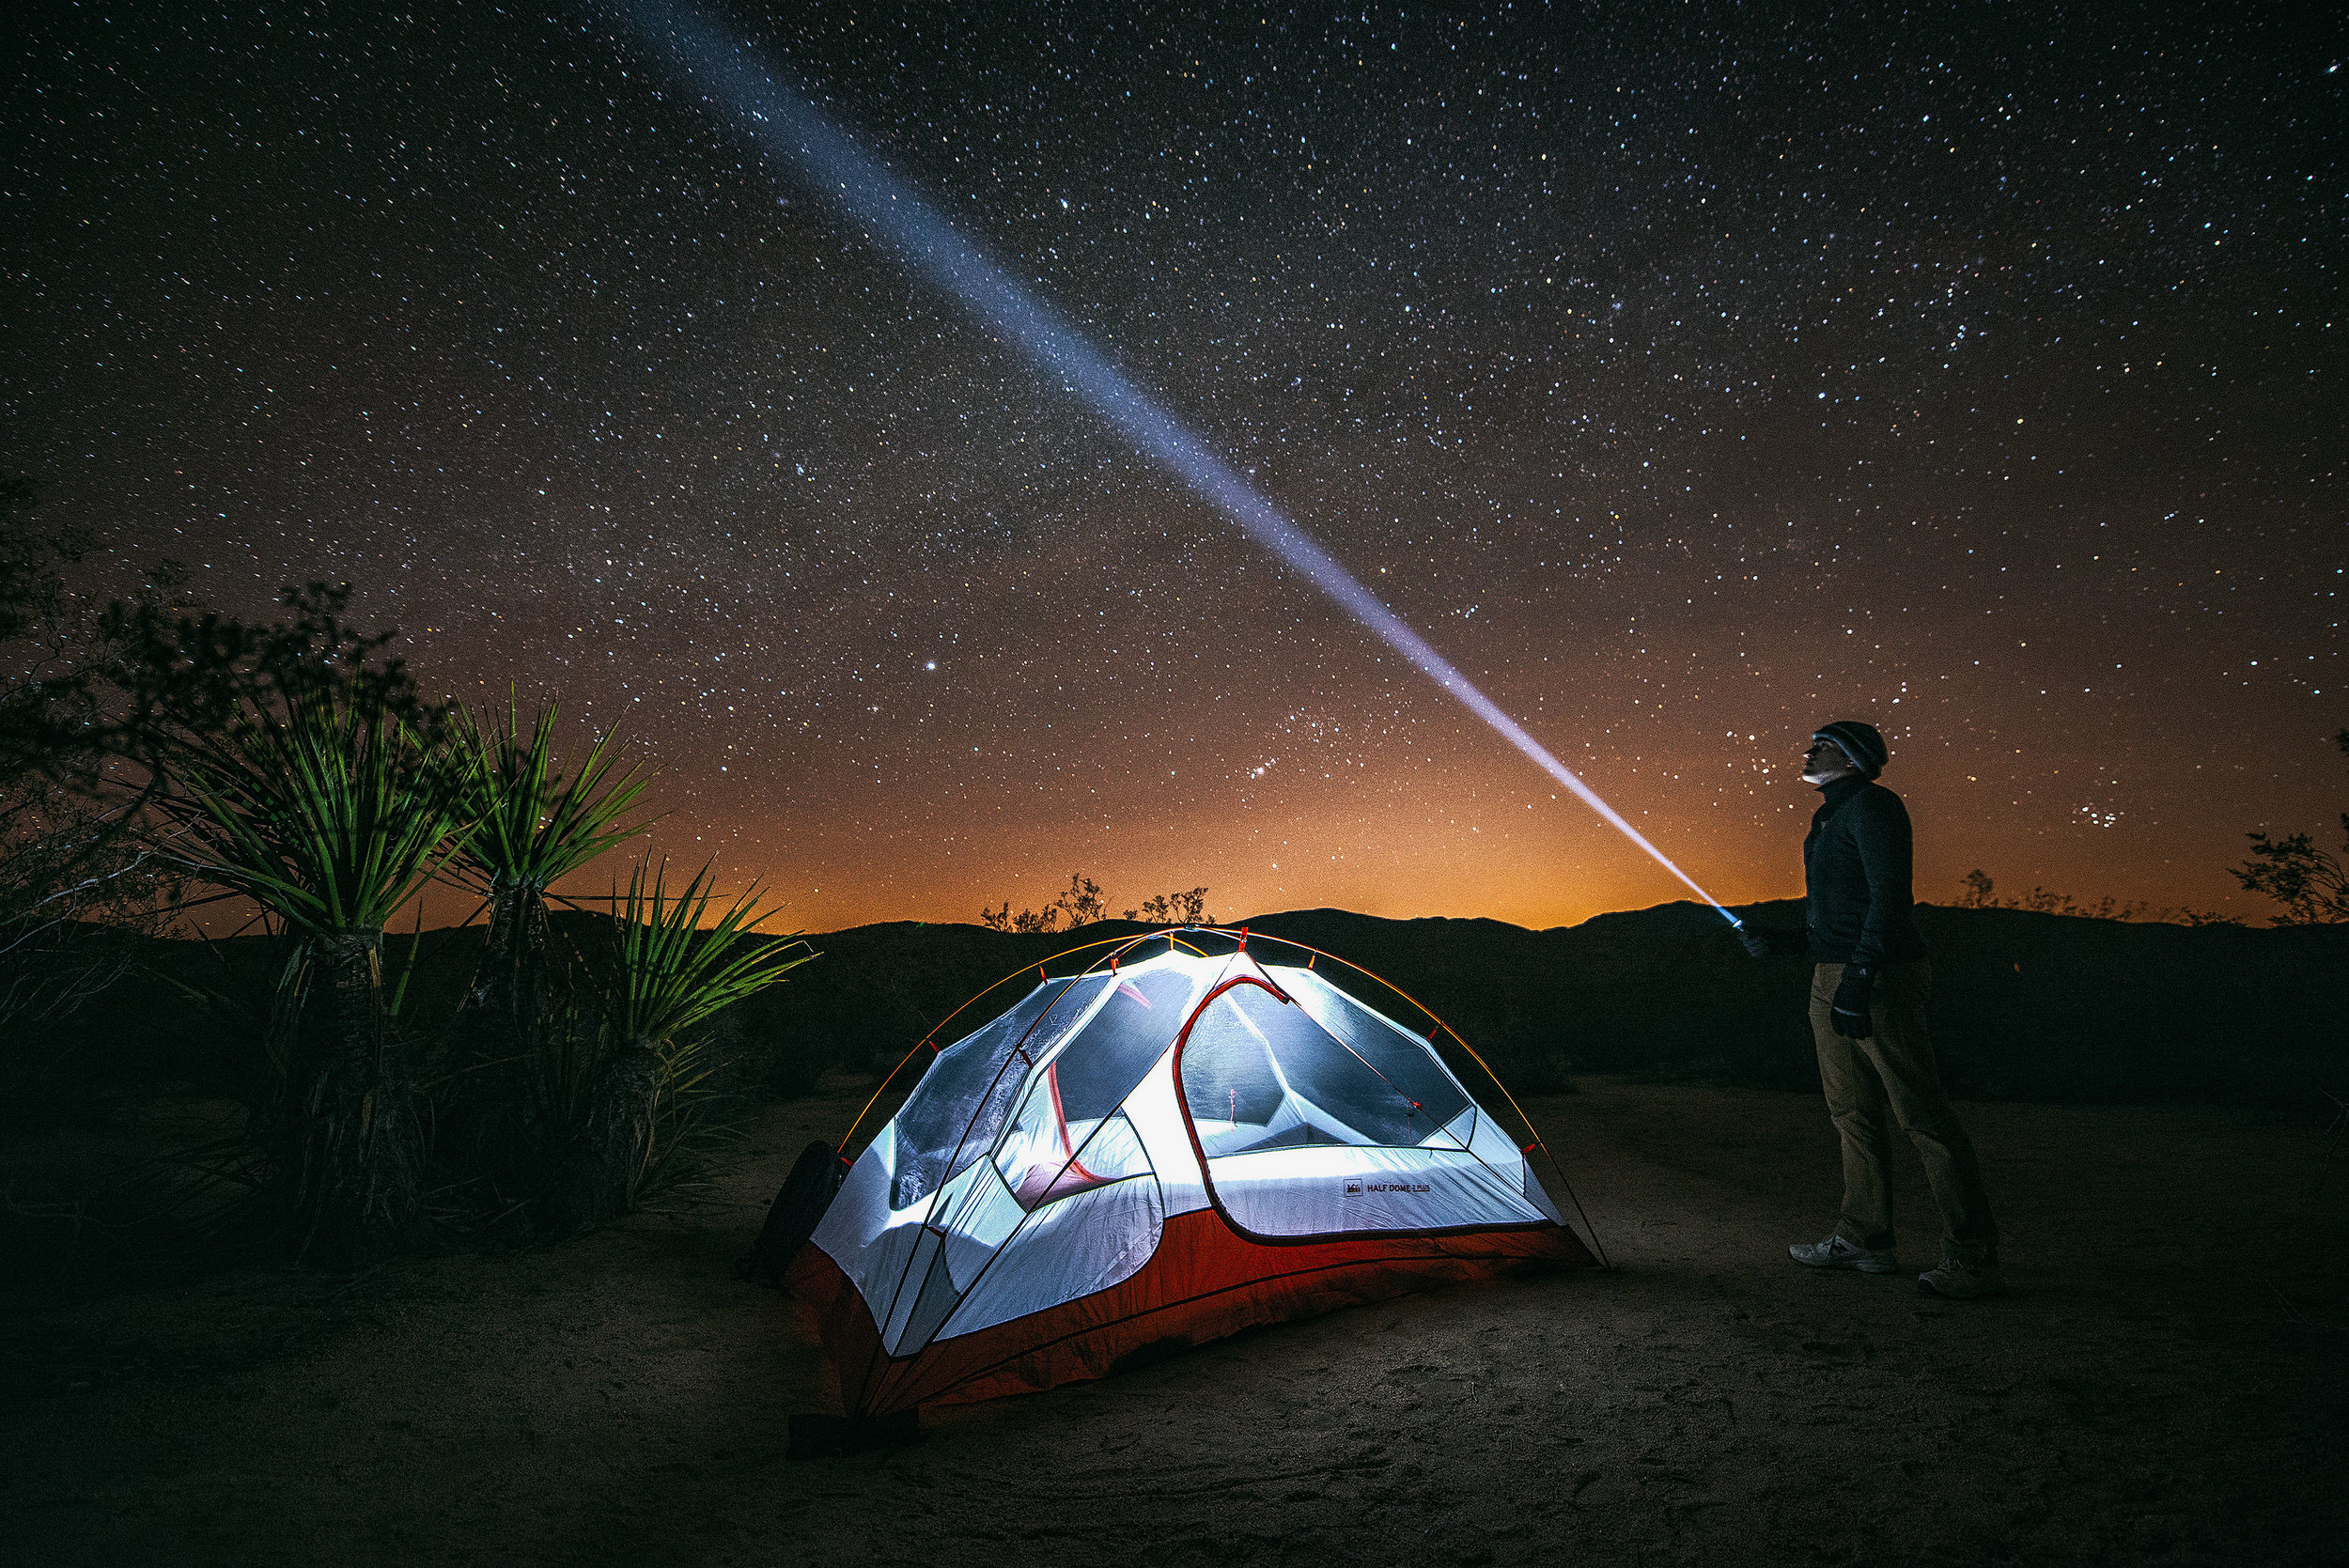 austin-trigg-joshua-tree-national-park-glow-tent-light-long-exposure-night-sky-stars.jpg